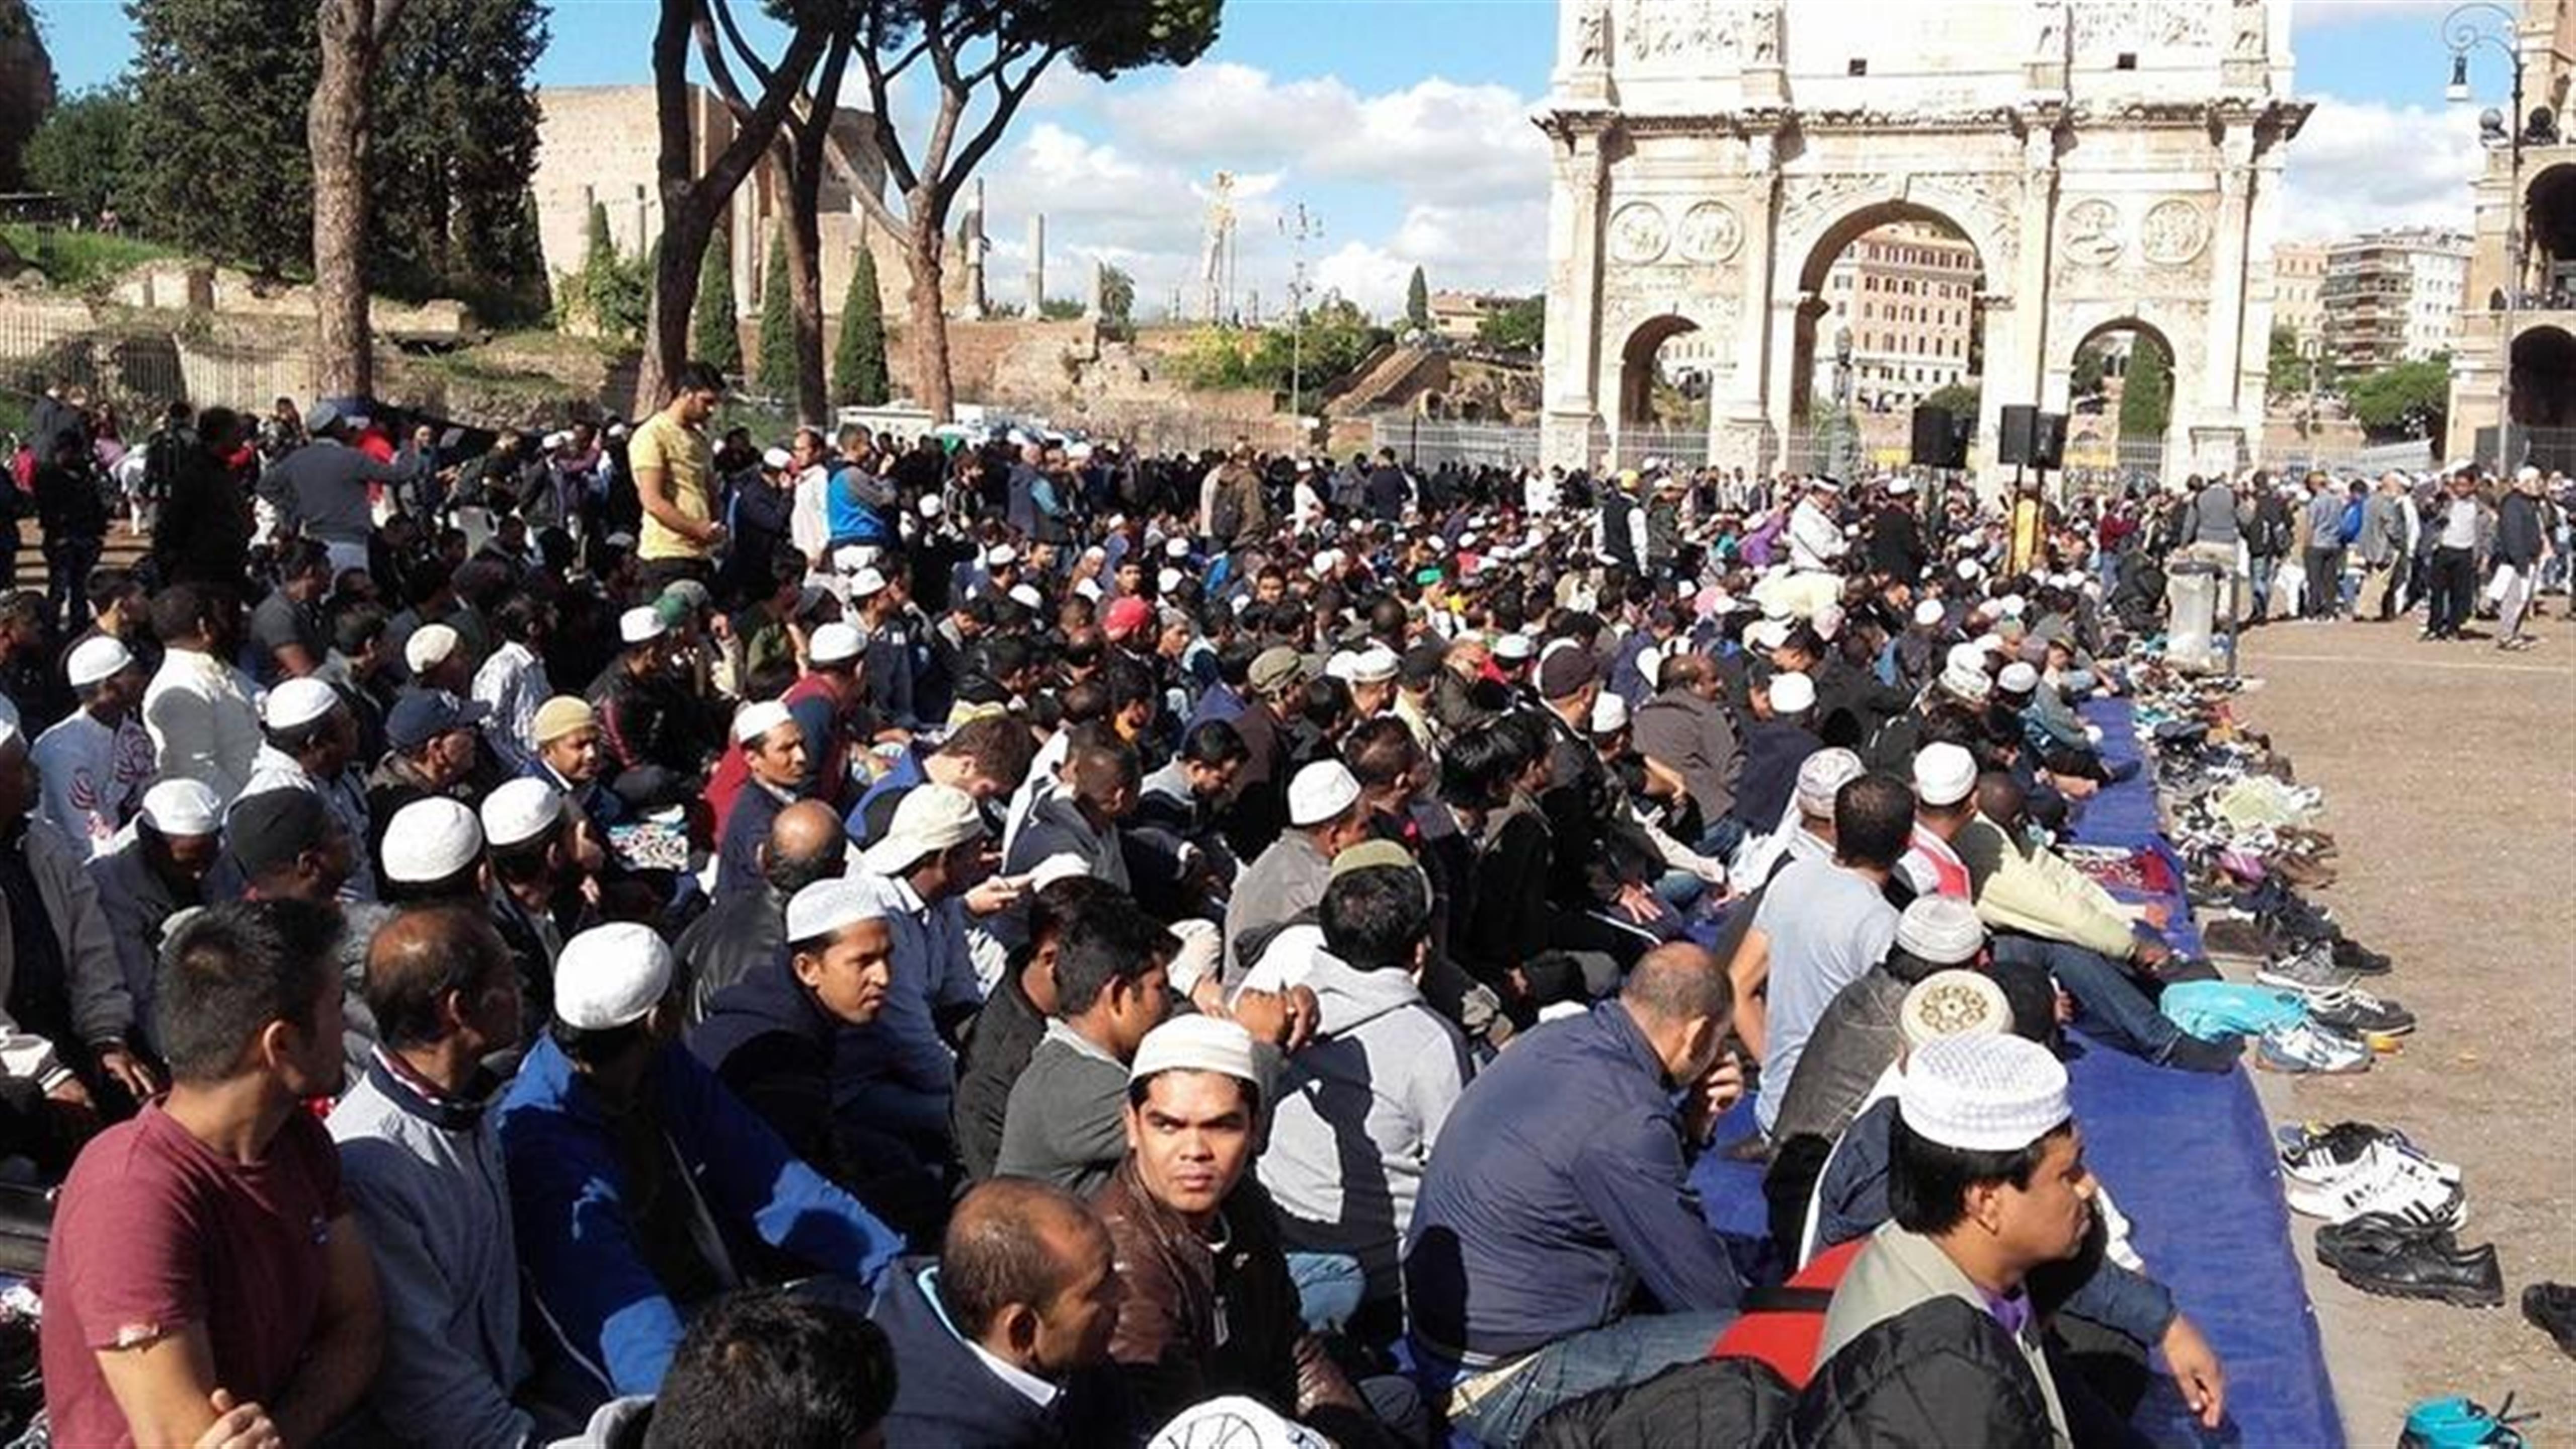 Moschee e libertà di culto: diritti e urbanistica